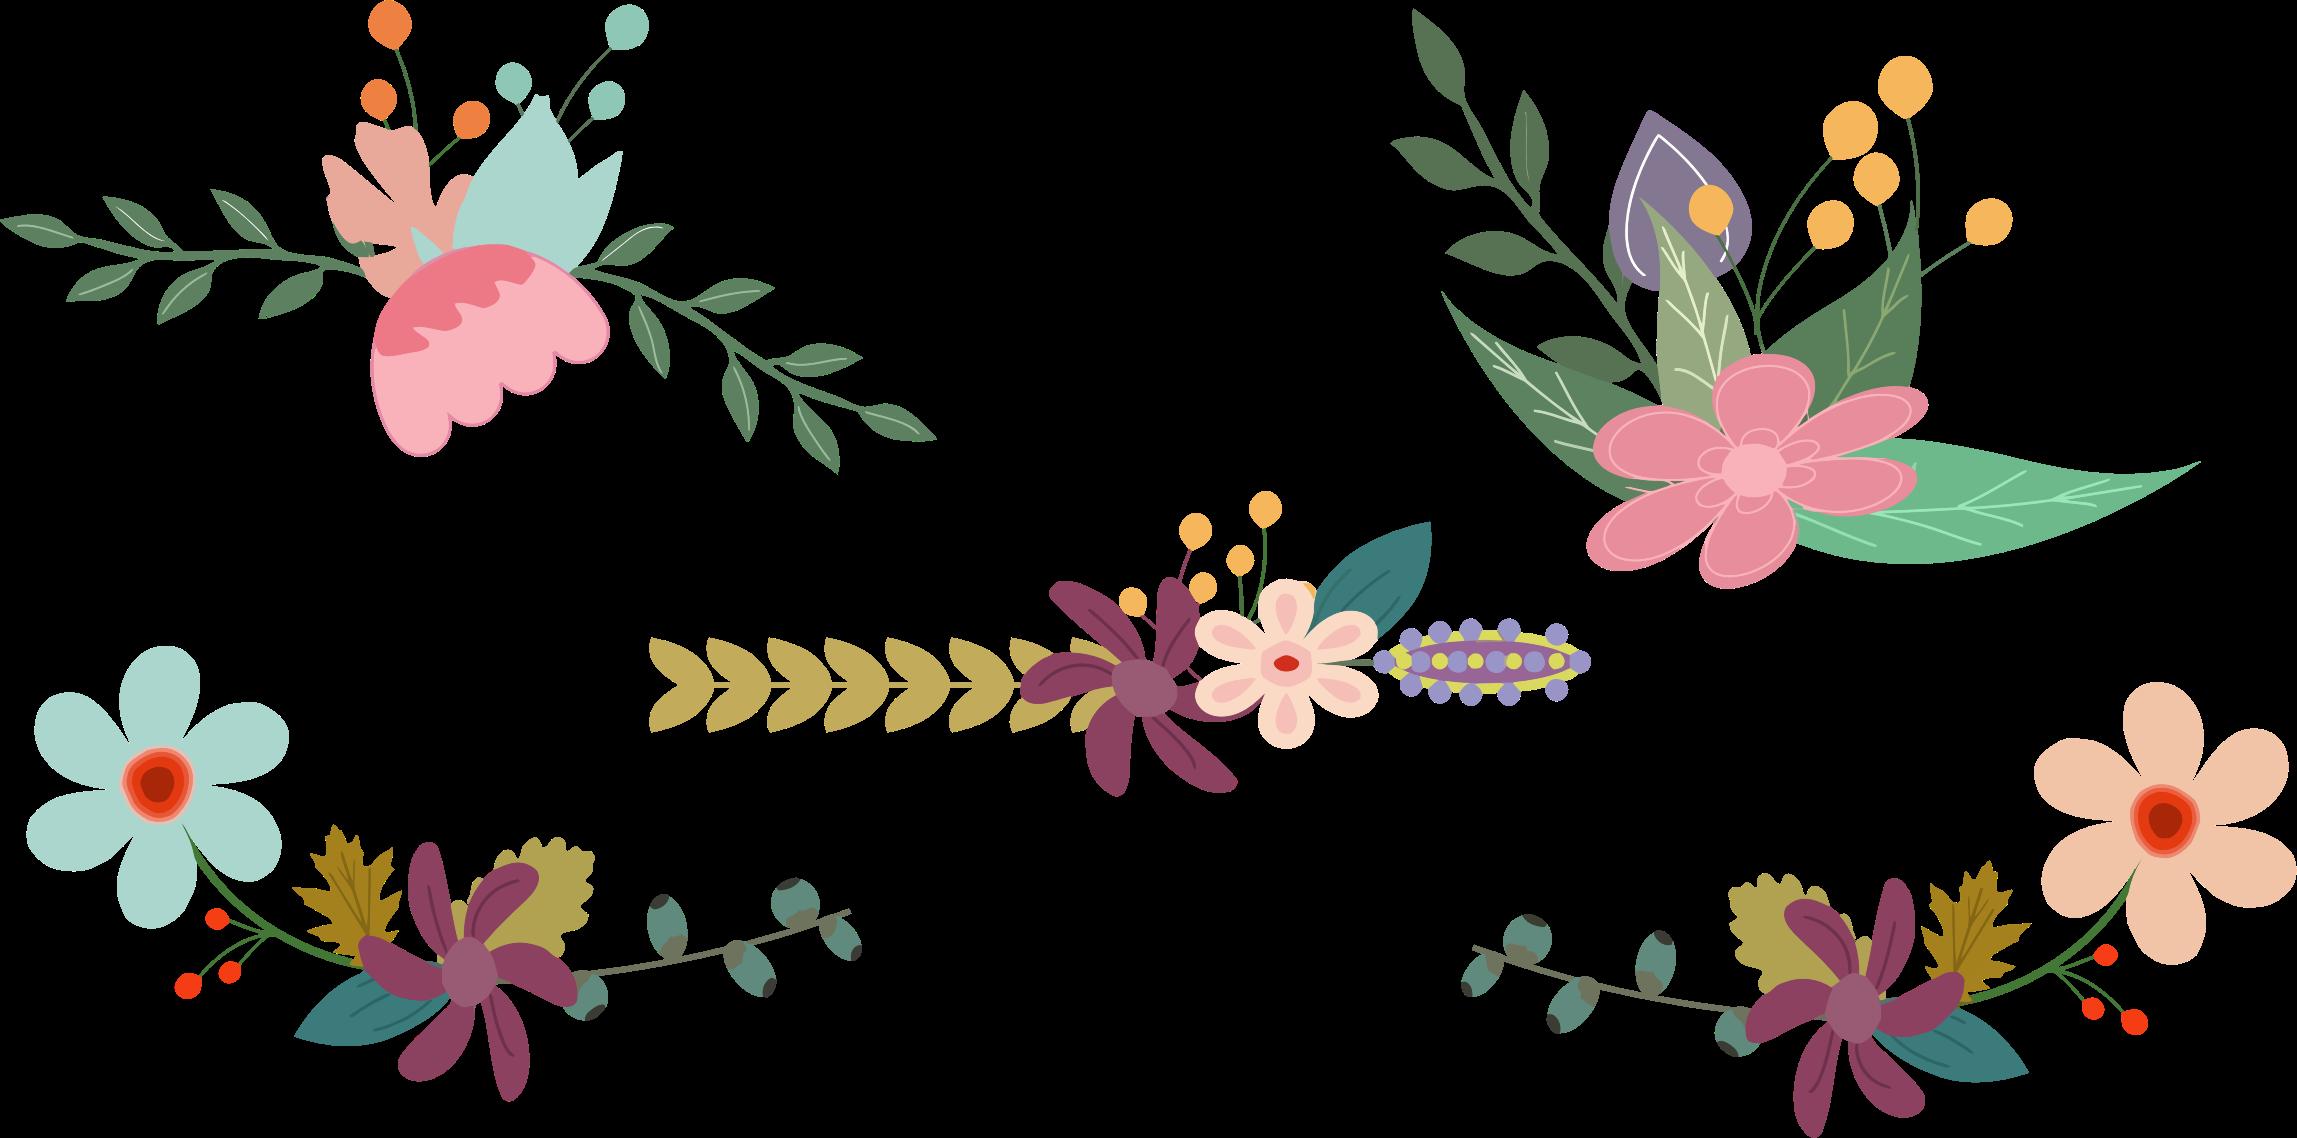 Floral elements big image. Clipart flowers vintage